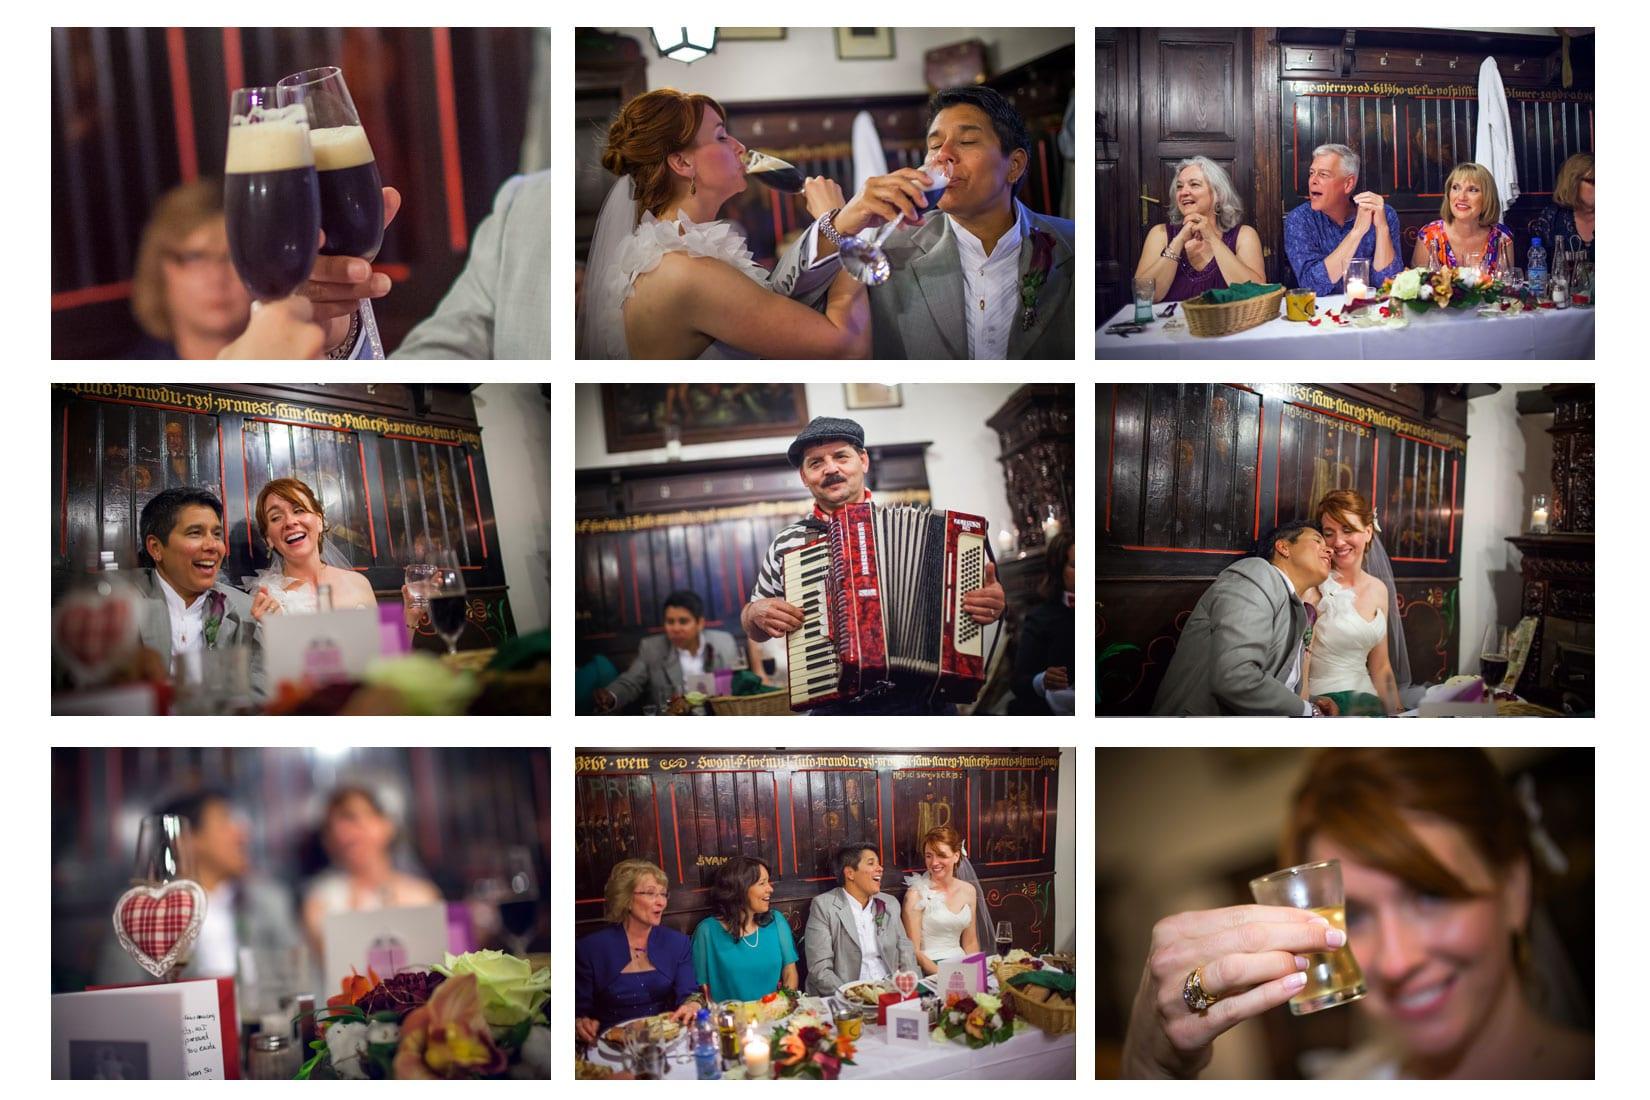 Charles Bridge Wedding / Kimberly & Jules / U Flecku wedding party